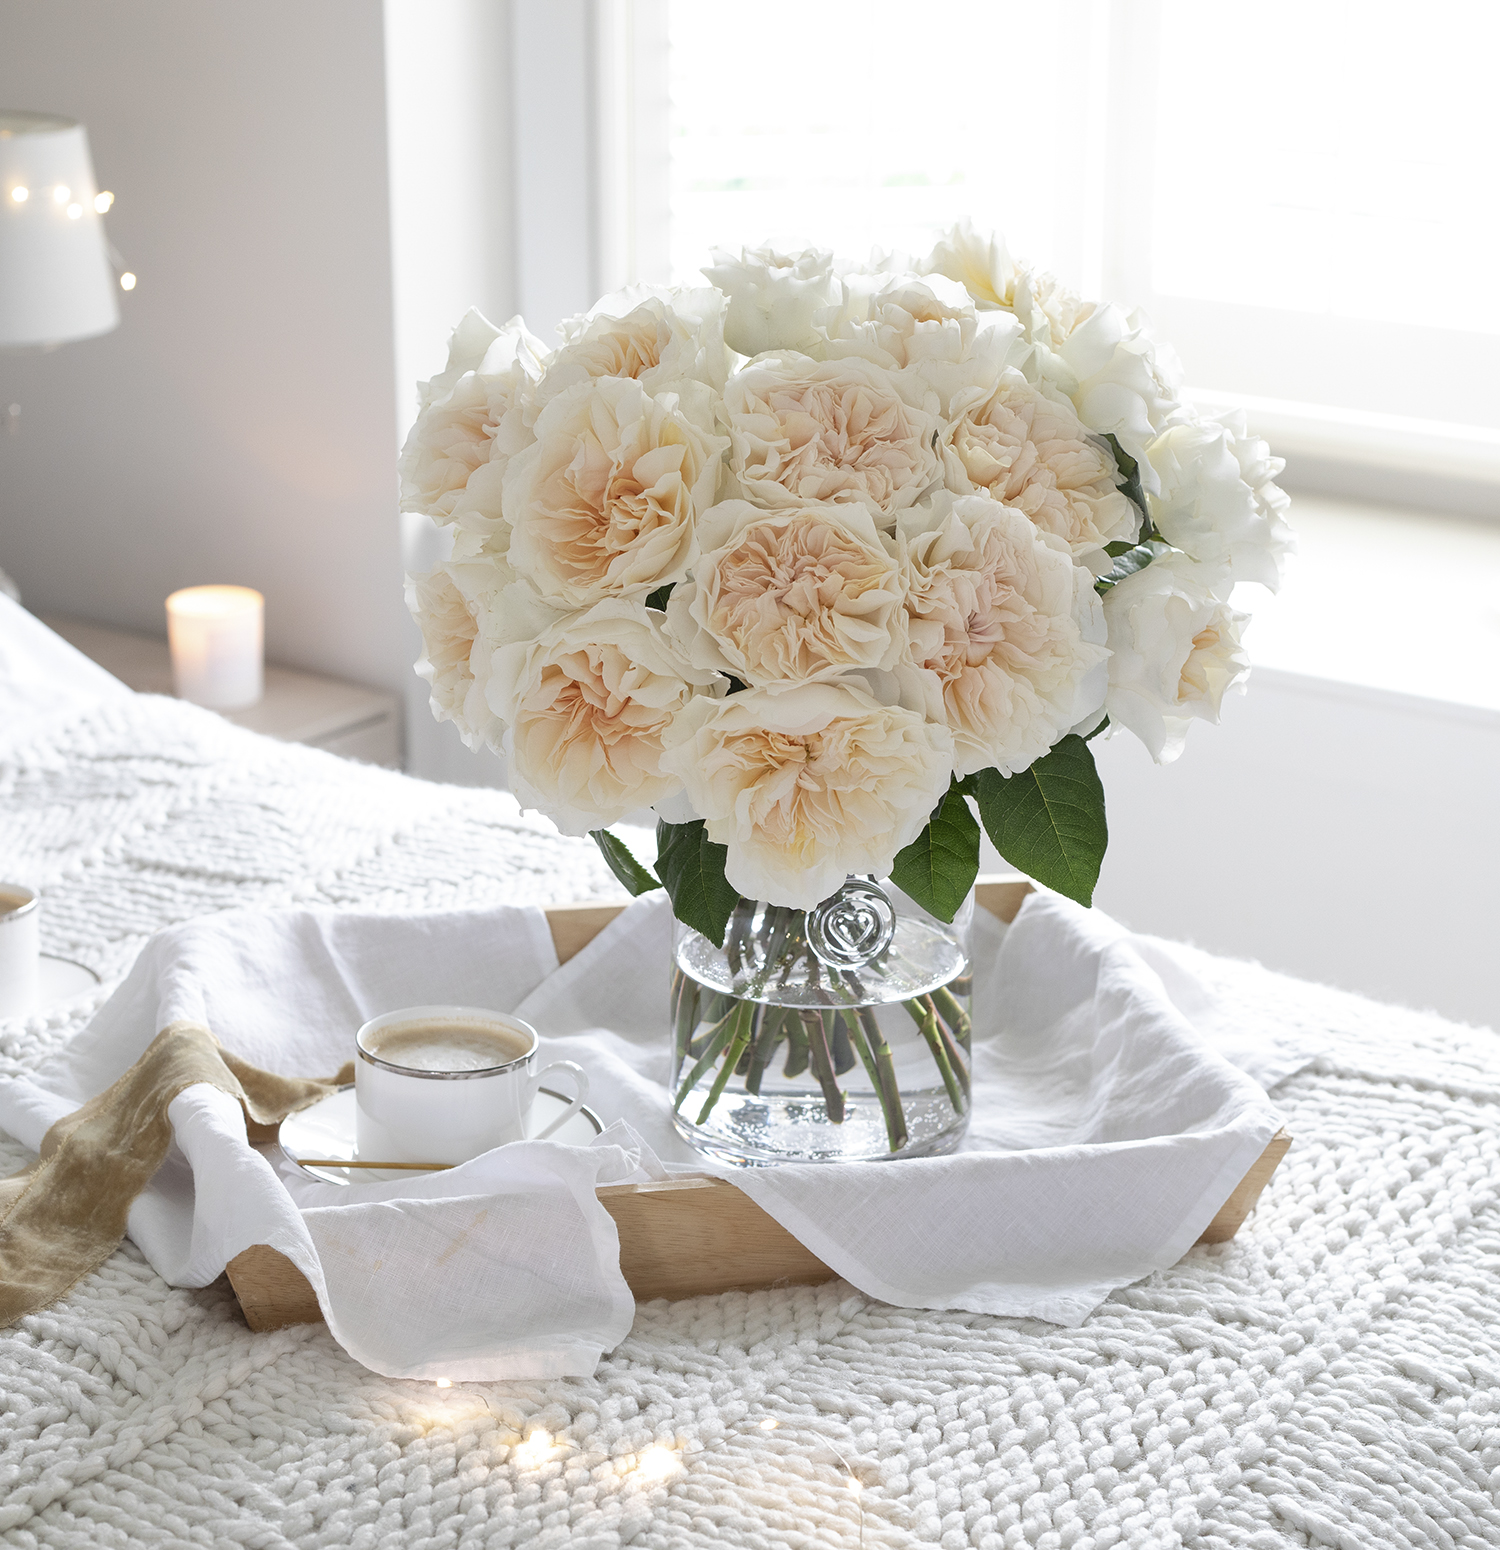 Eugenie Rose David Austin Valentine Roses Breakfast in bed